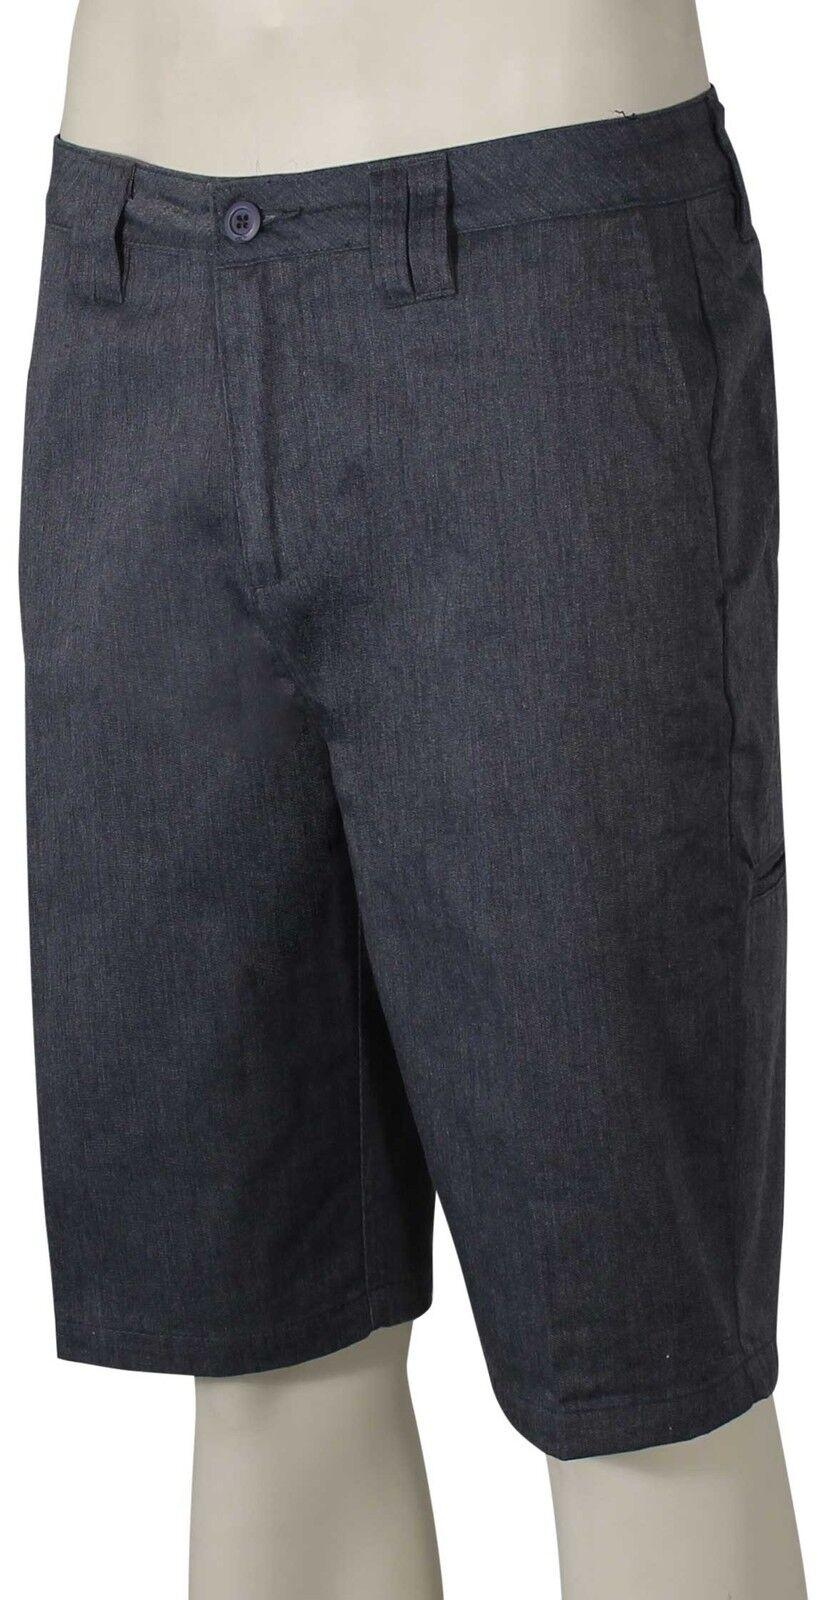 O'Neill Contact Walk Shorts - bluee Heather - New